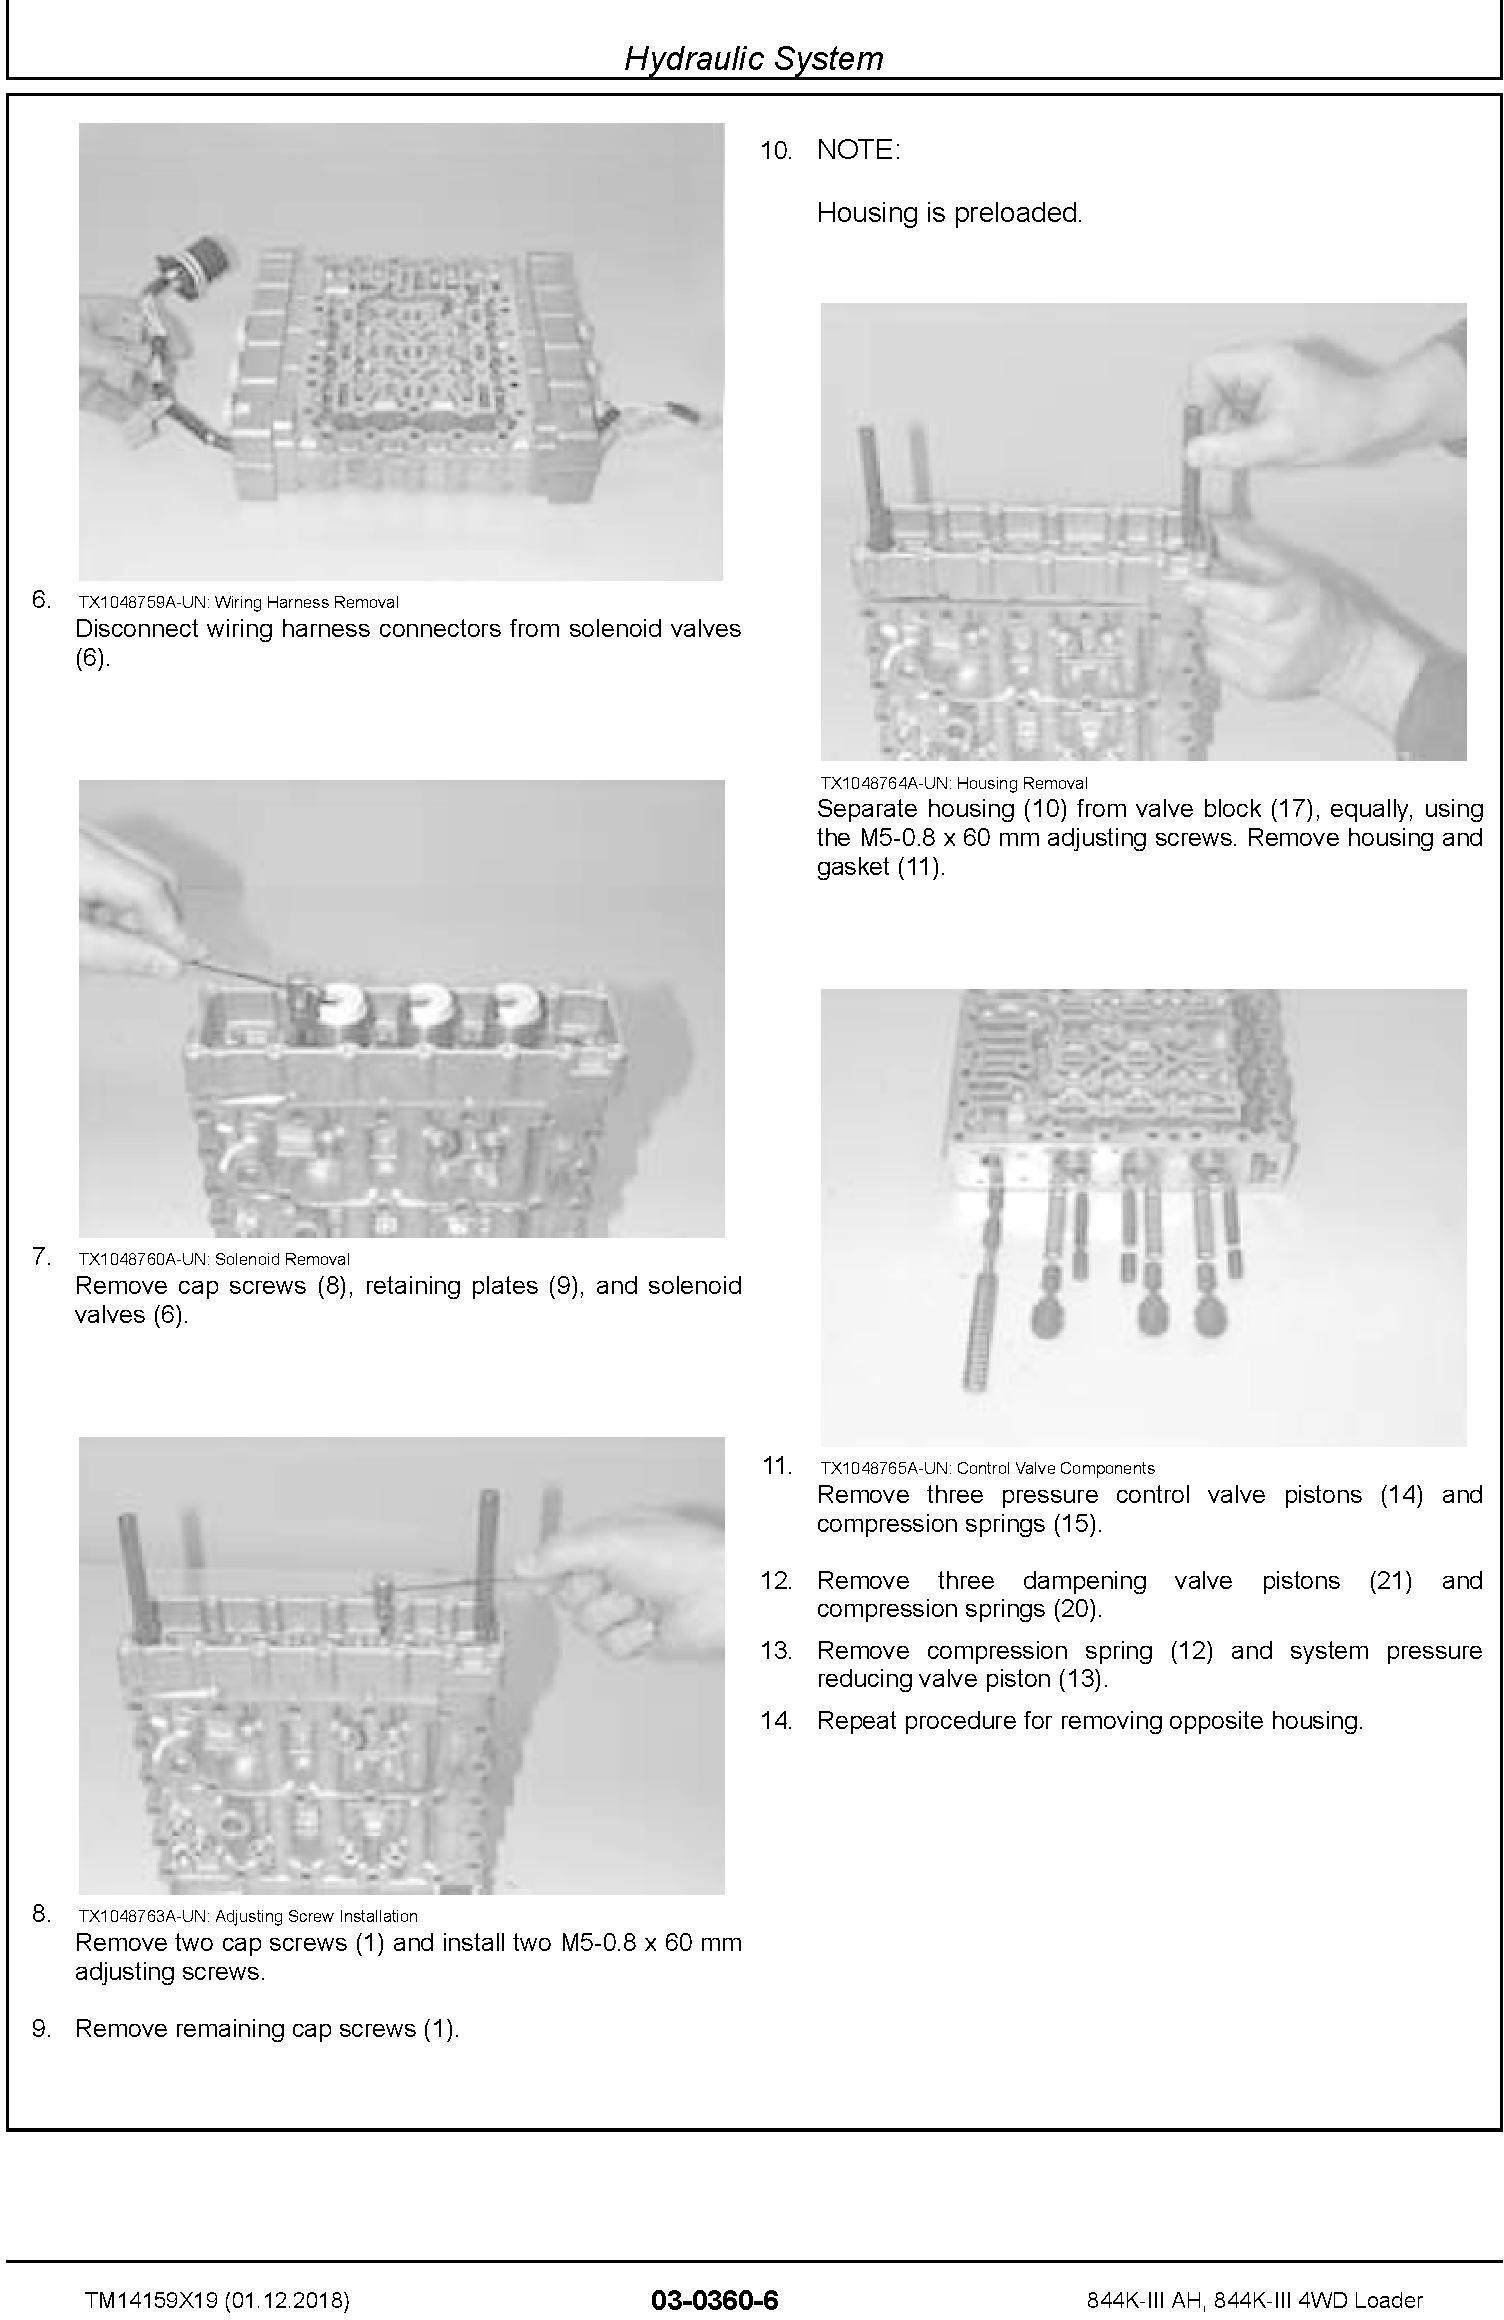 John Deere 844K-III (AH) SN. from F677782 4WD Loader Repair Technical Service Manual (TM14159X19) - 2